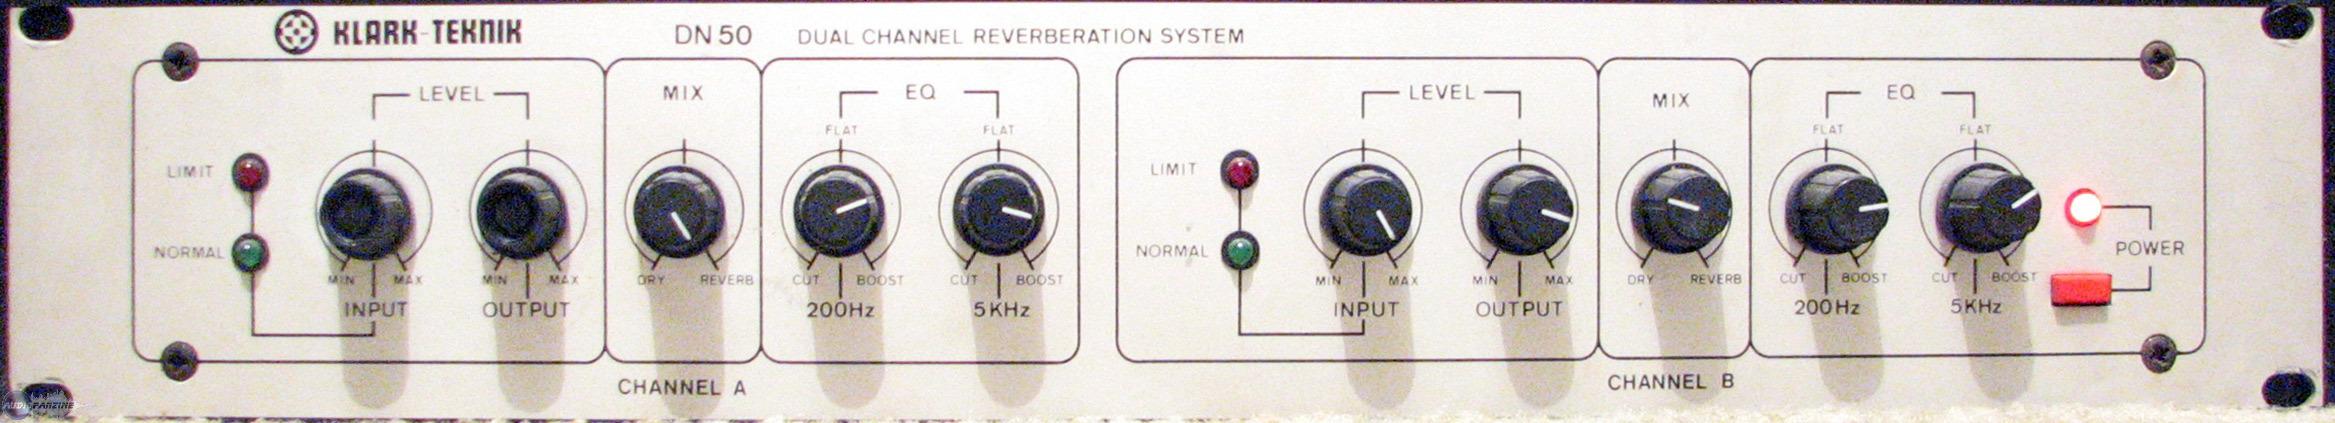 analizando sweet dreams de eurythmics Reverb Klark Teknik DN50